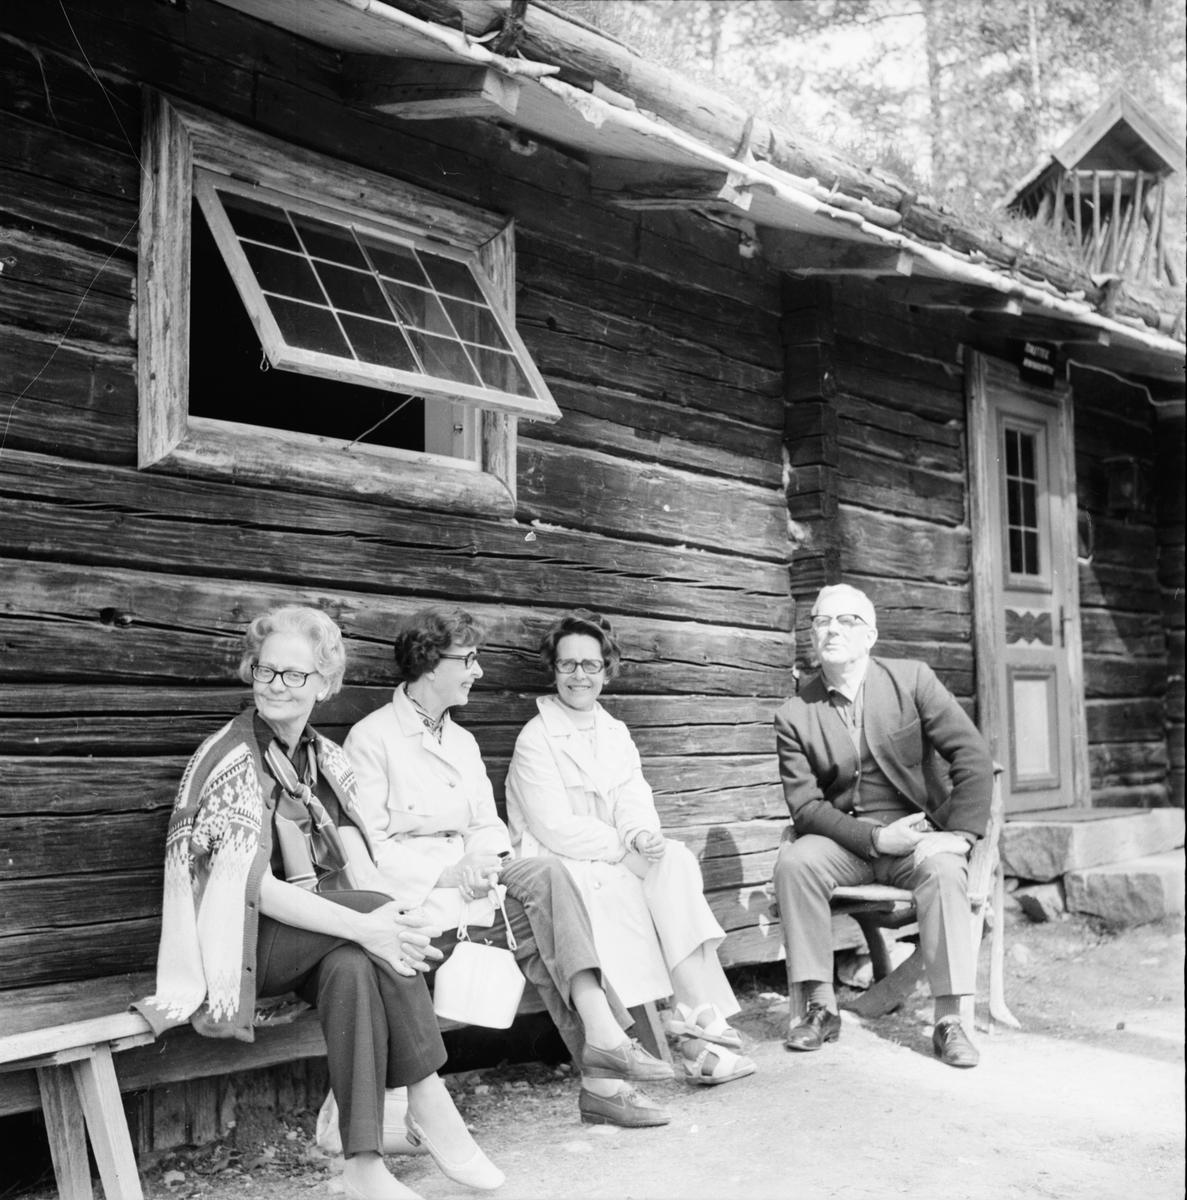 Jössebo, Scouter fr. Arbrå, Juli 1970